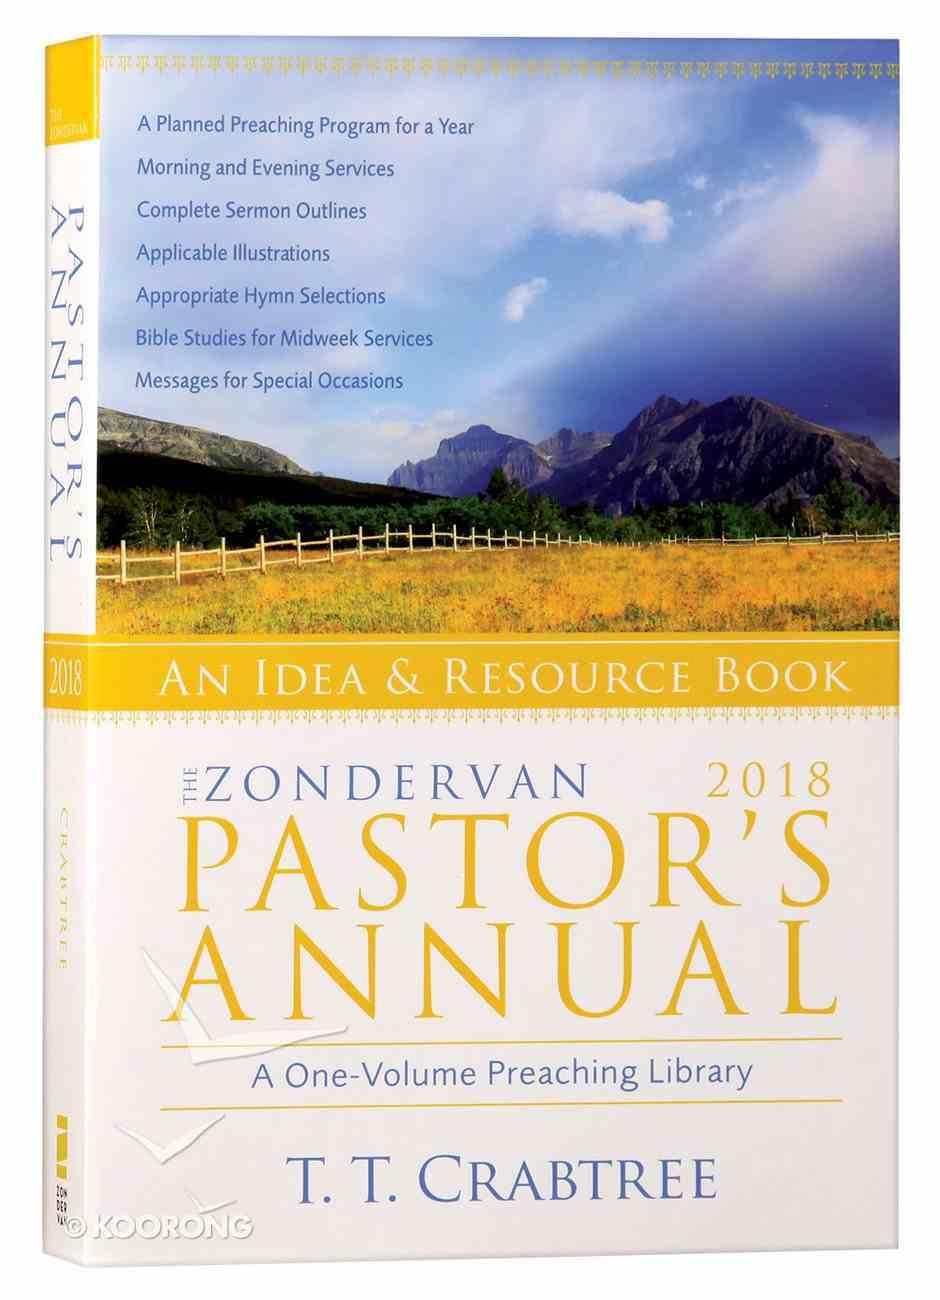 The Zondervan 2018 Pastor's Annual Paperback